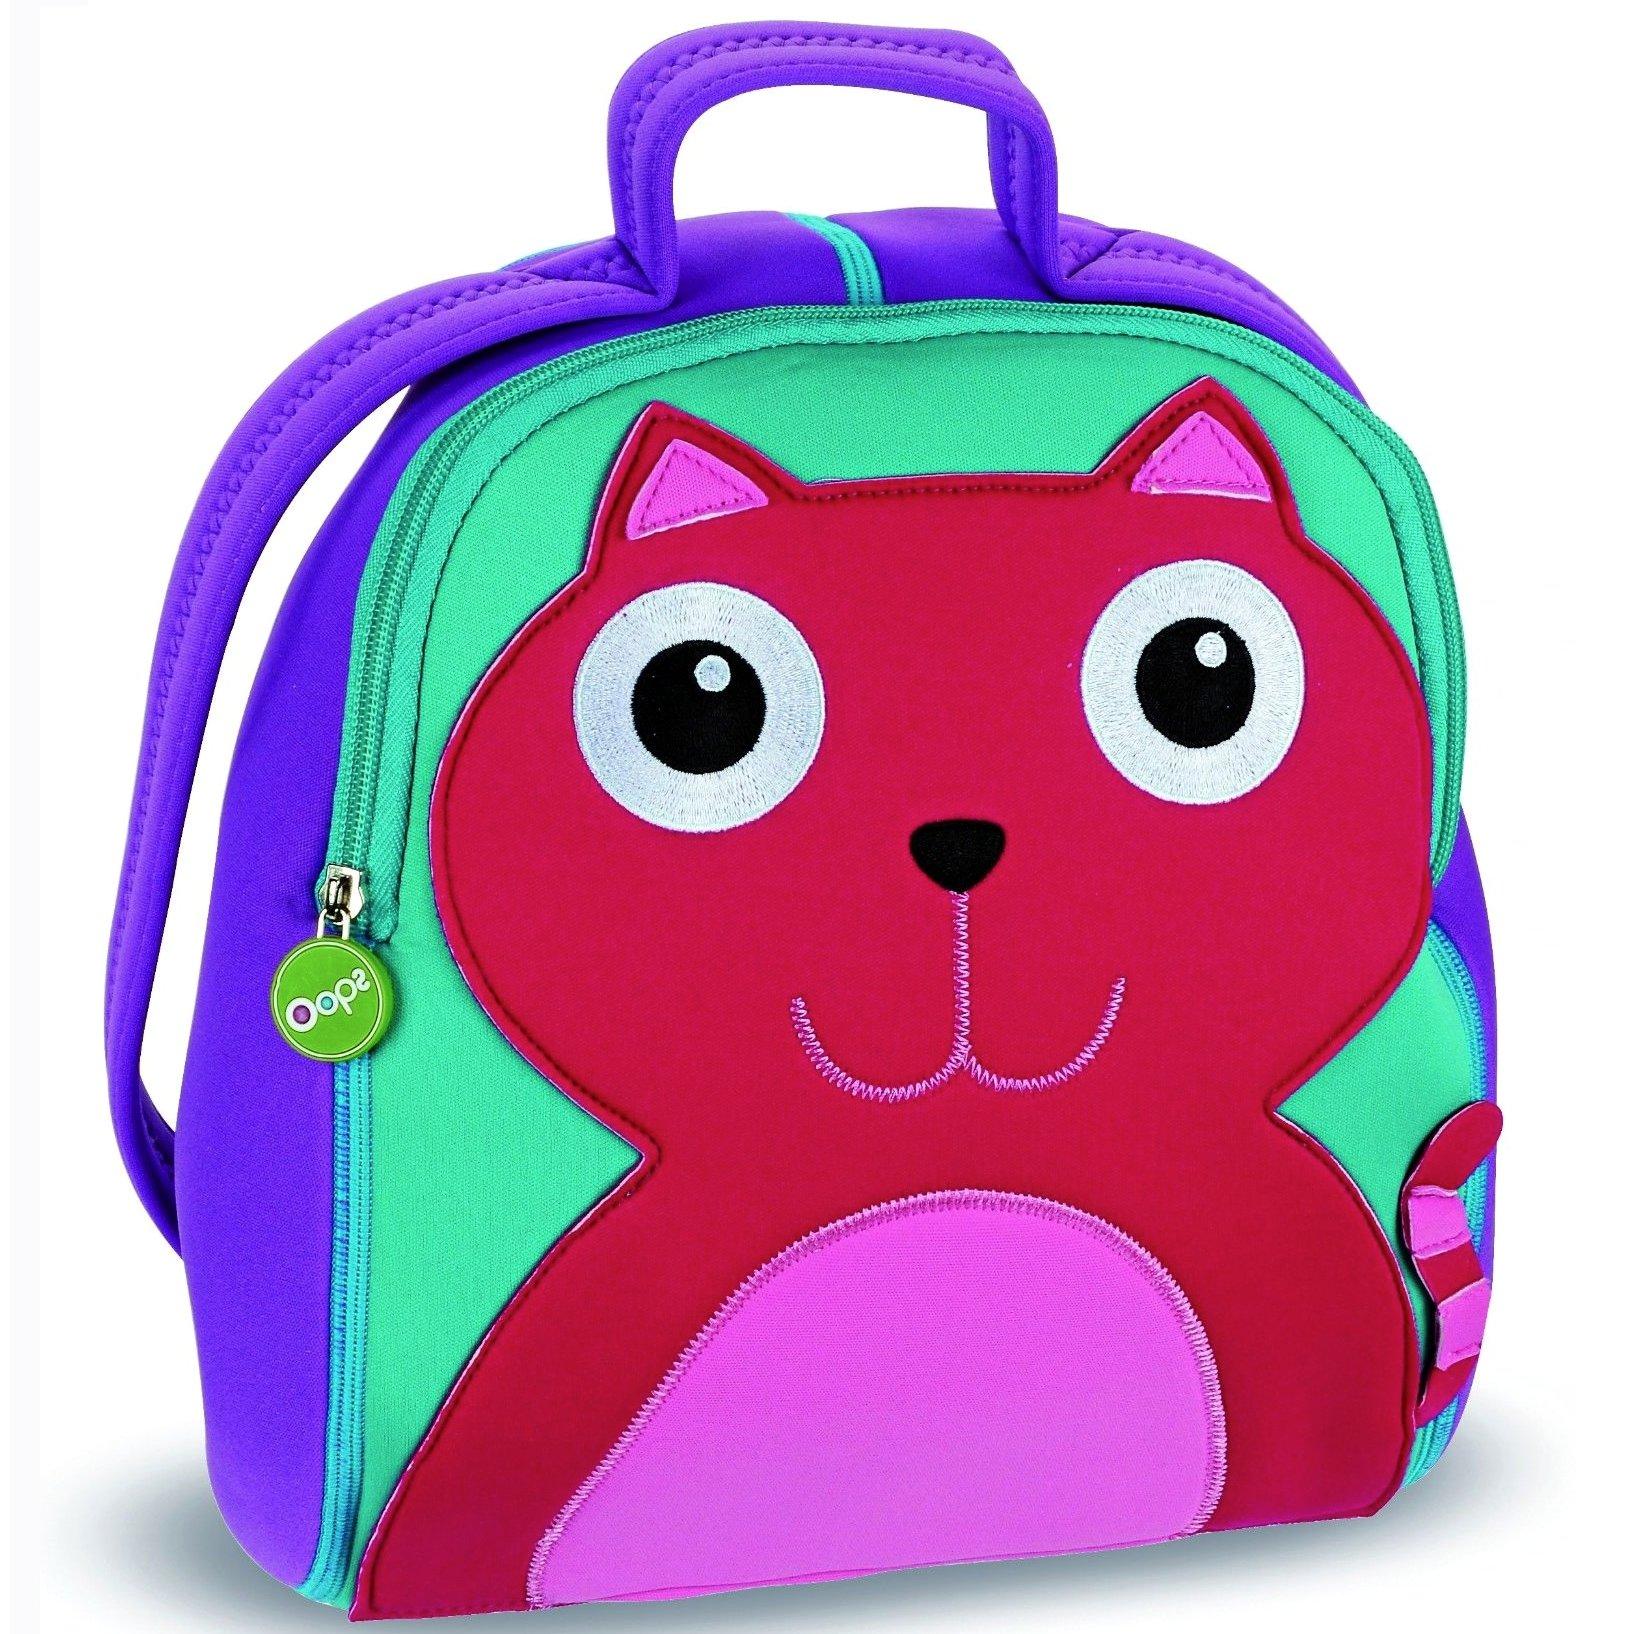 Oops All I Need Backpack Cat Αδιάβροχο Σακίδιο Πλάτης Γάτα μητέρα παιδί   αξεσουάρ και παιχνίδια   βρεφικά   παιδικά ανταλλακτικά και αξεσο